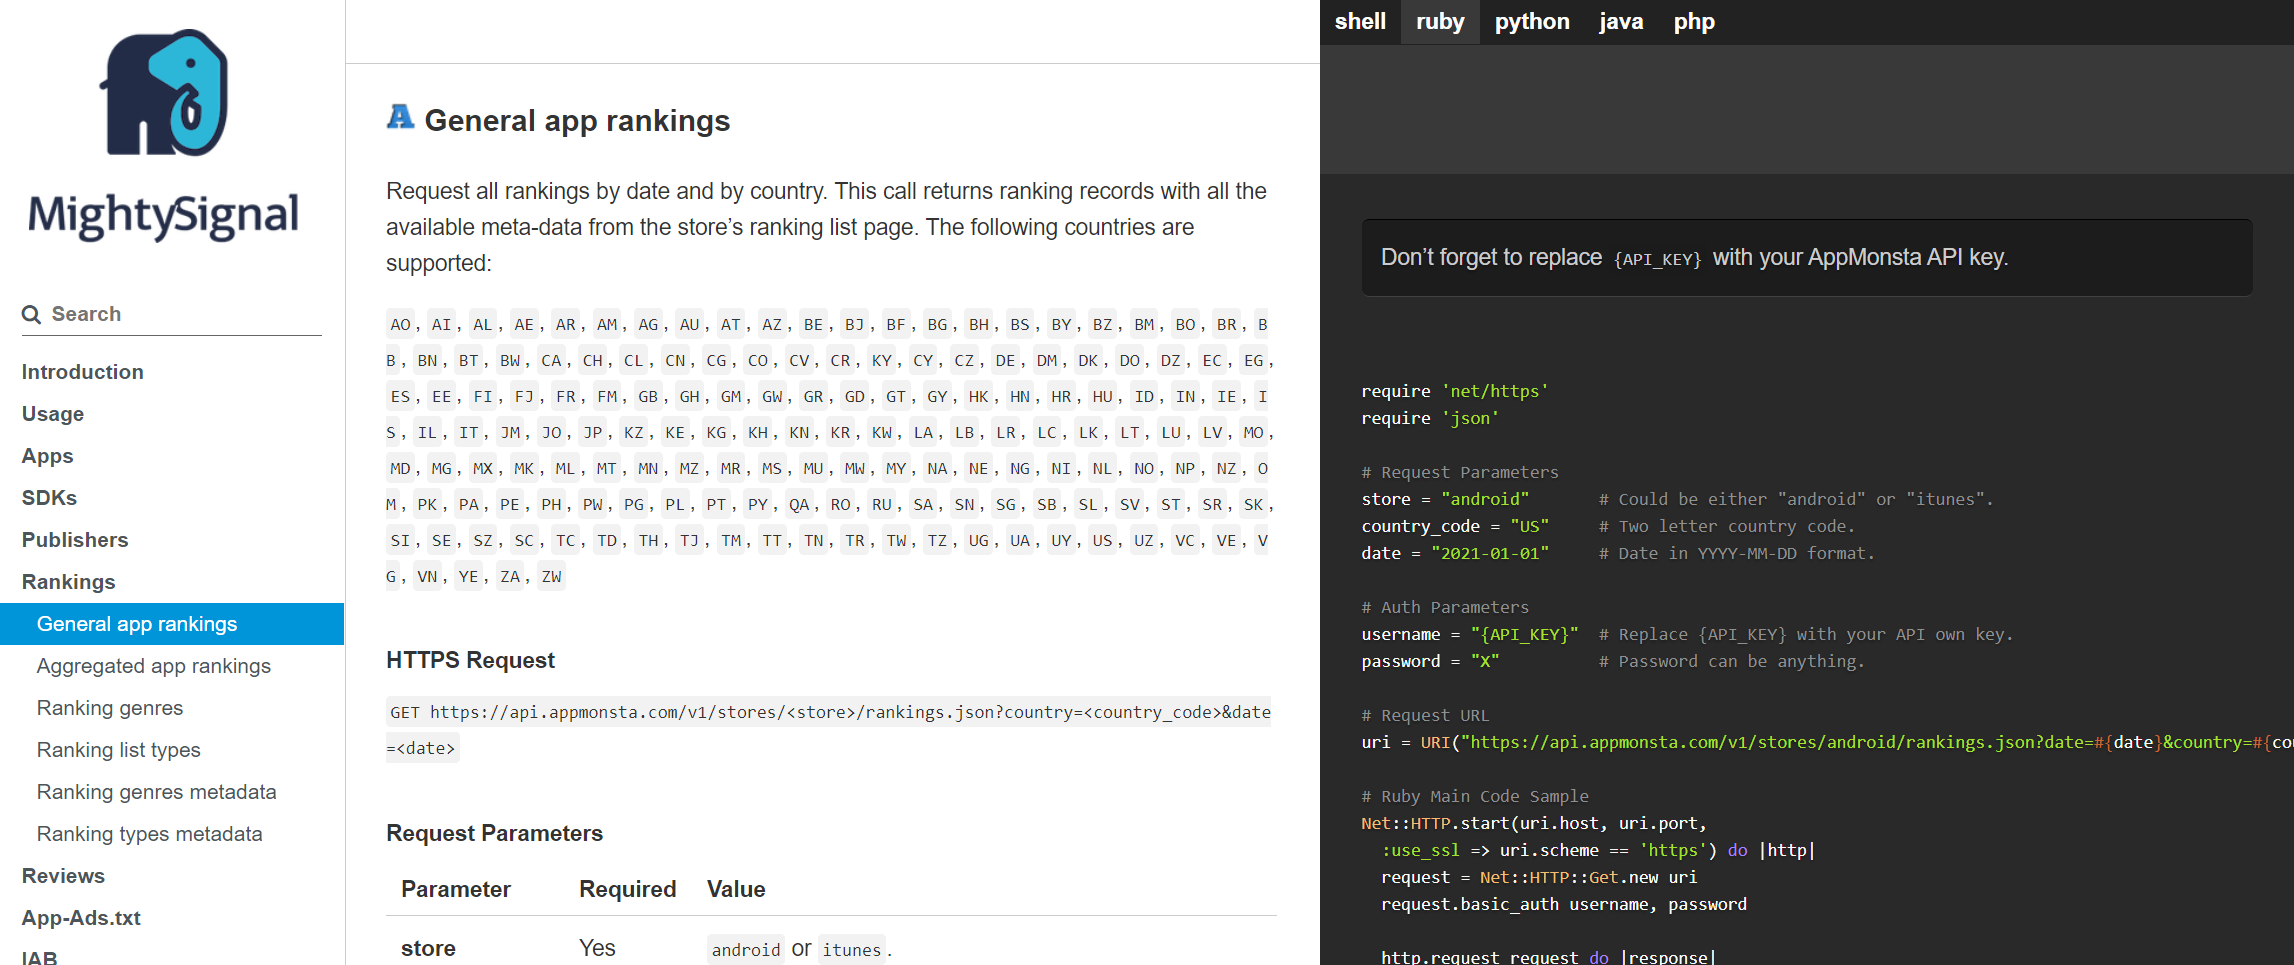 MightySignal Announces New Unifed API Documentation